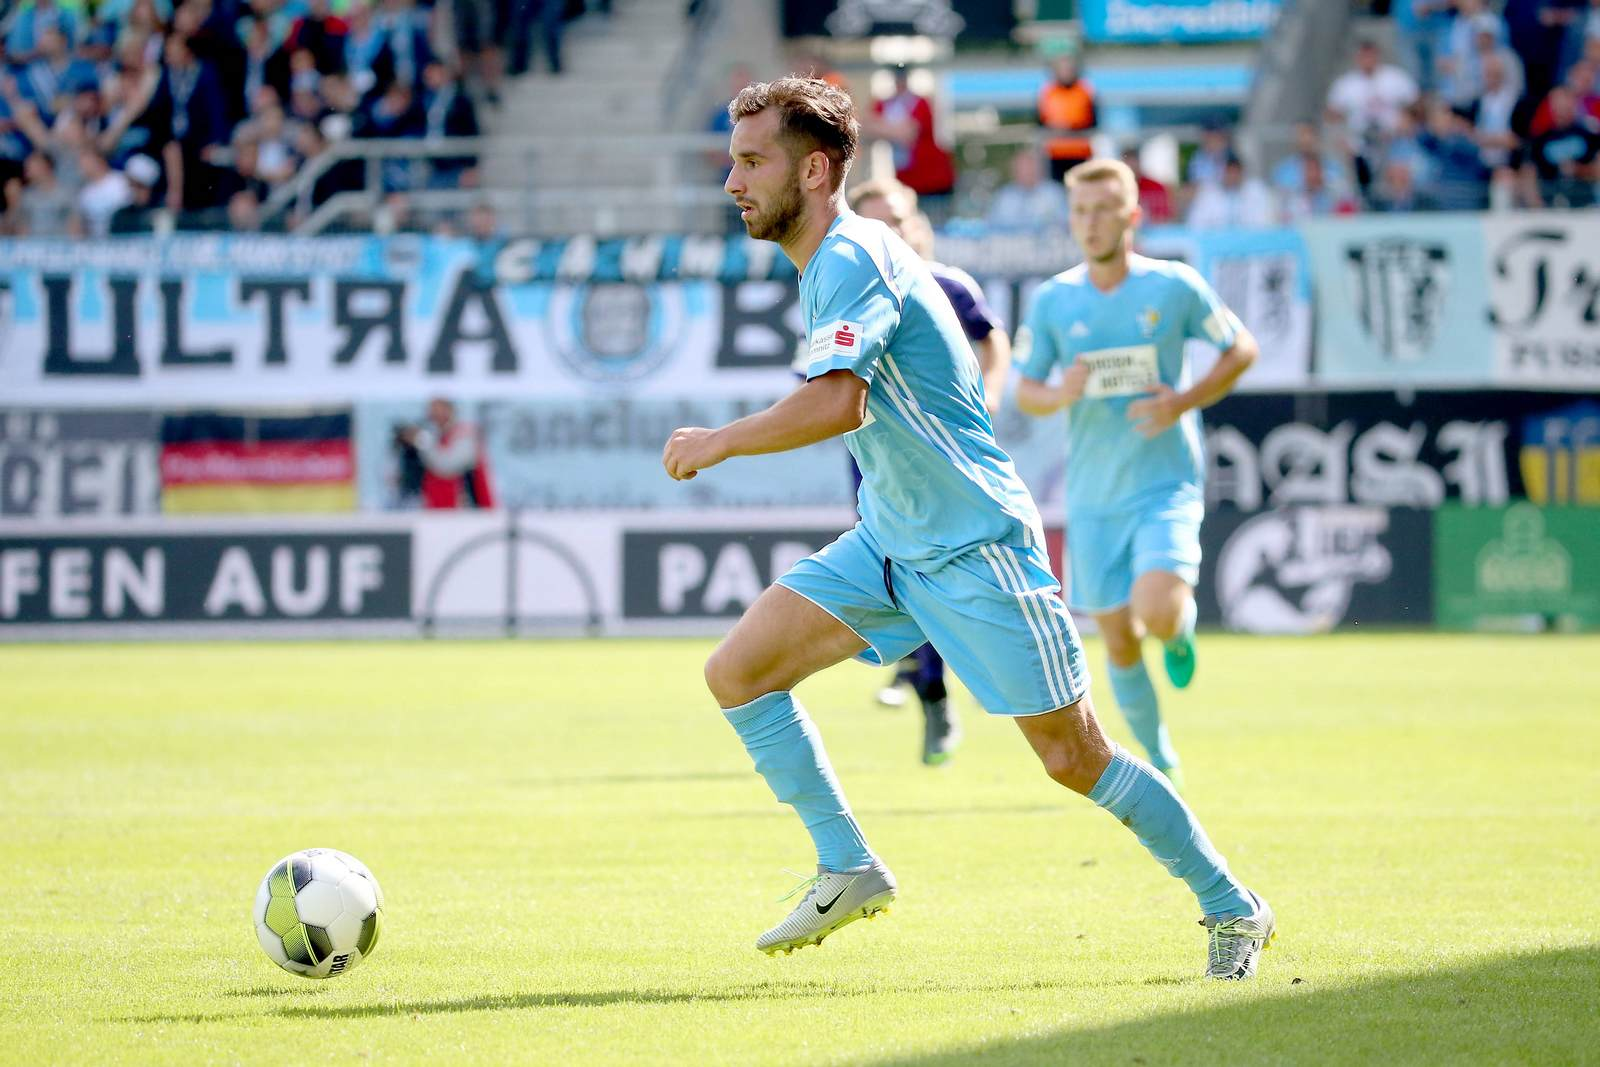 Okan Aydin am Ball für den Chemnitzer FC